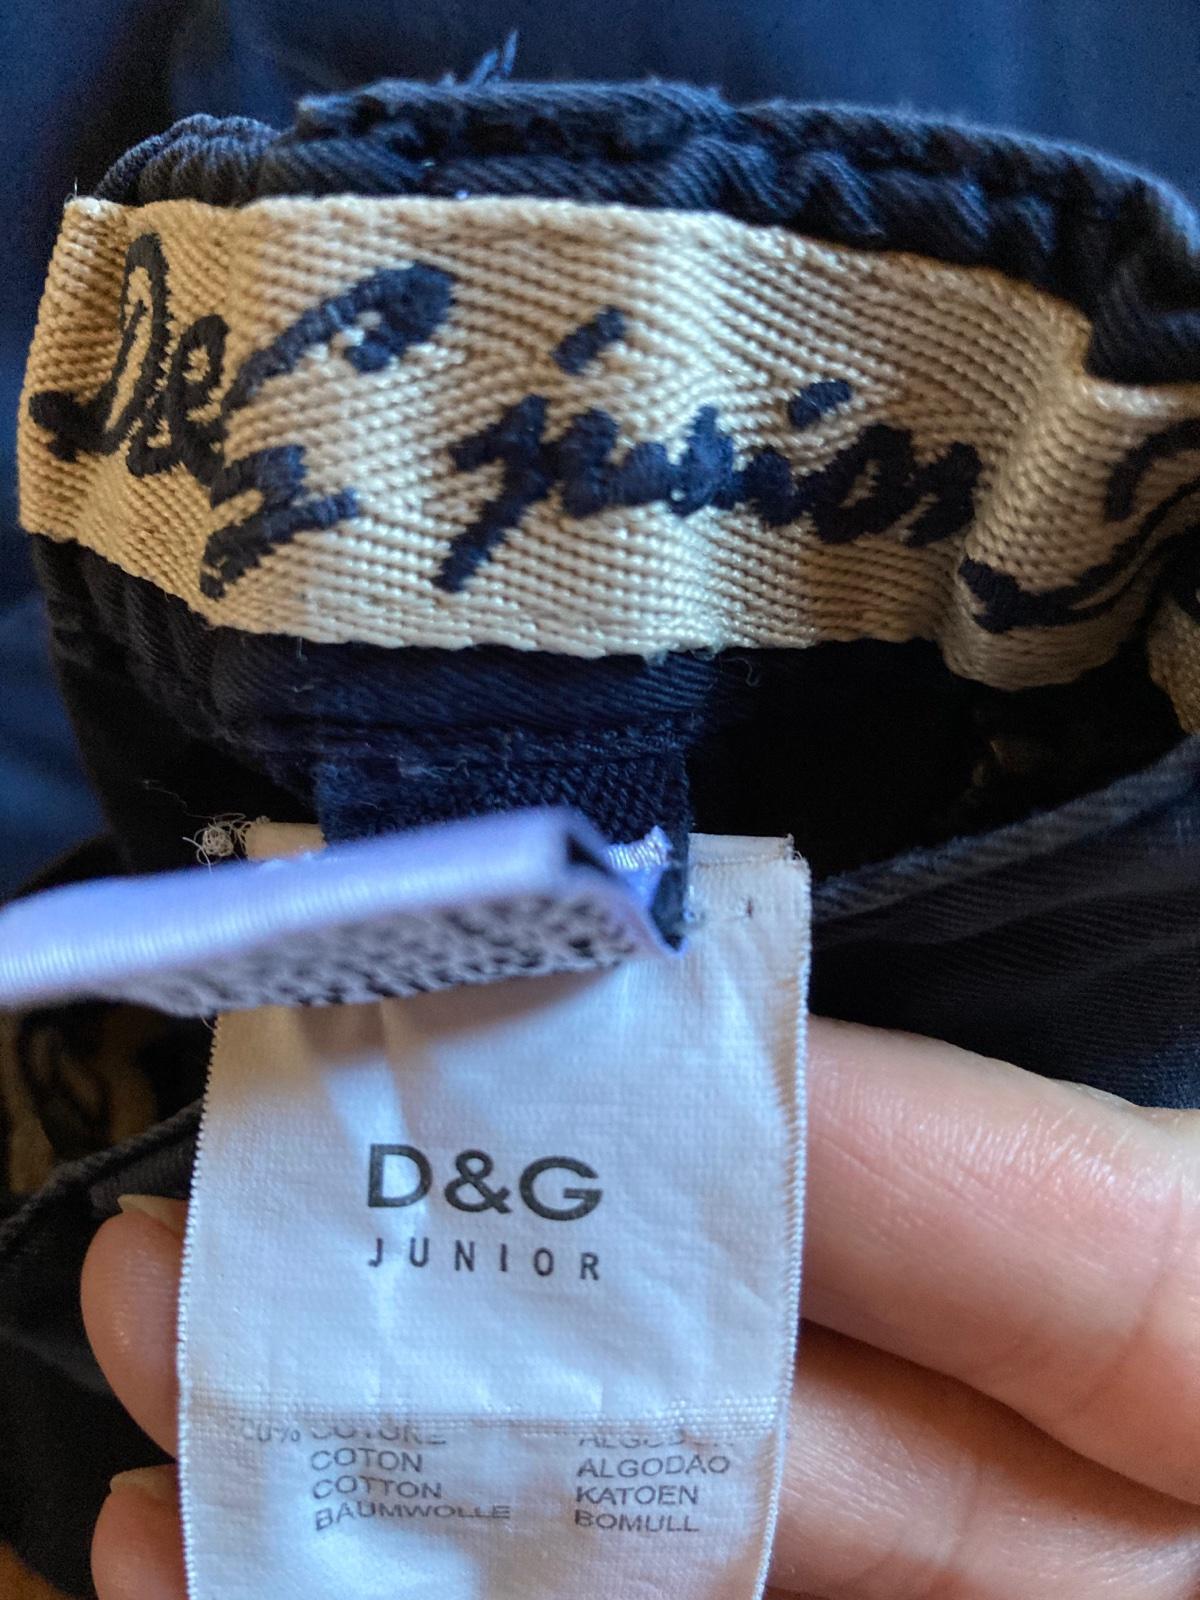 D&G Junior chlapčenské nohavice - Obrázok č. 3